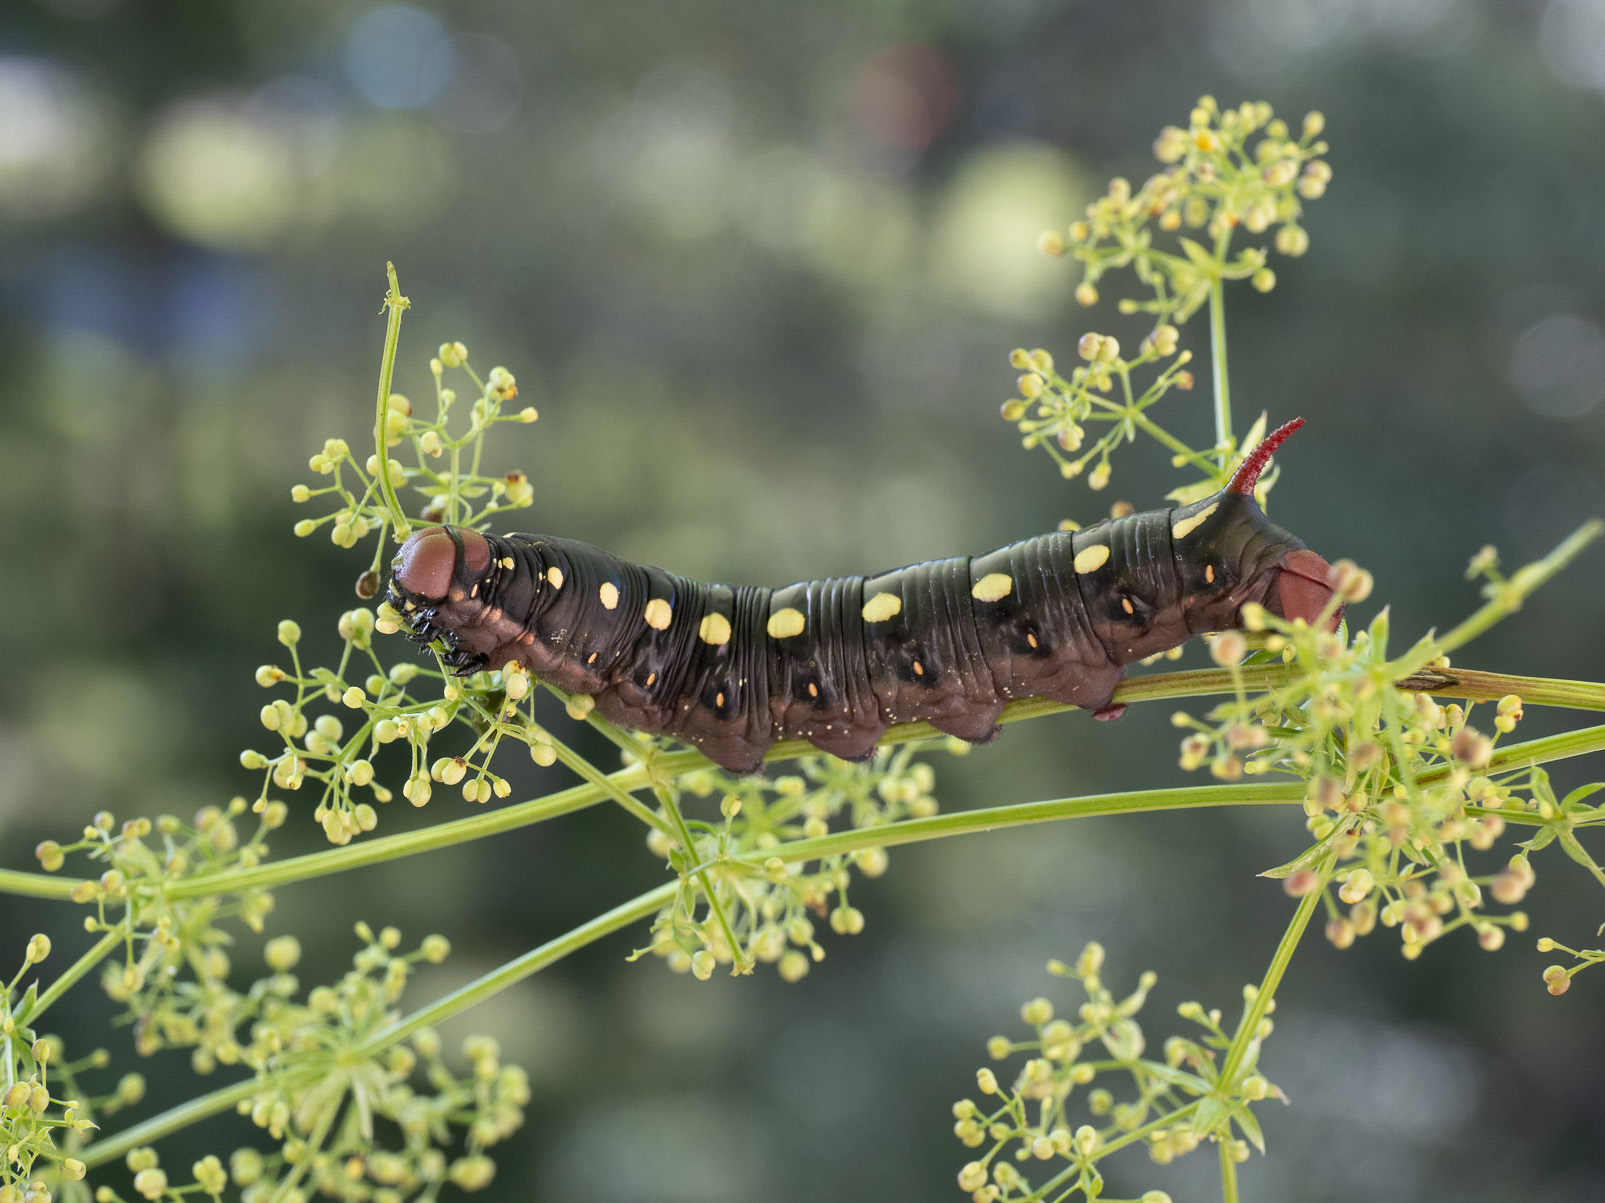 Гусеница бражника подмаренникового (Hyles gallii) в природном парке Görvaln. Автор фото: Сутормина Марина